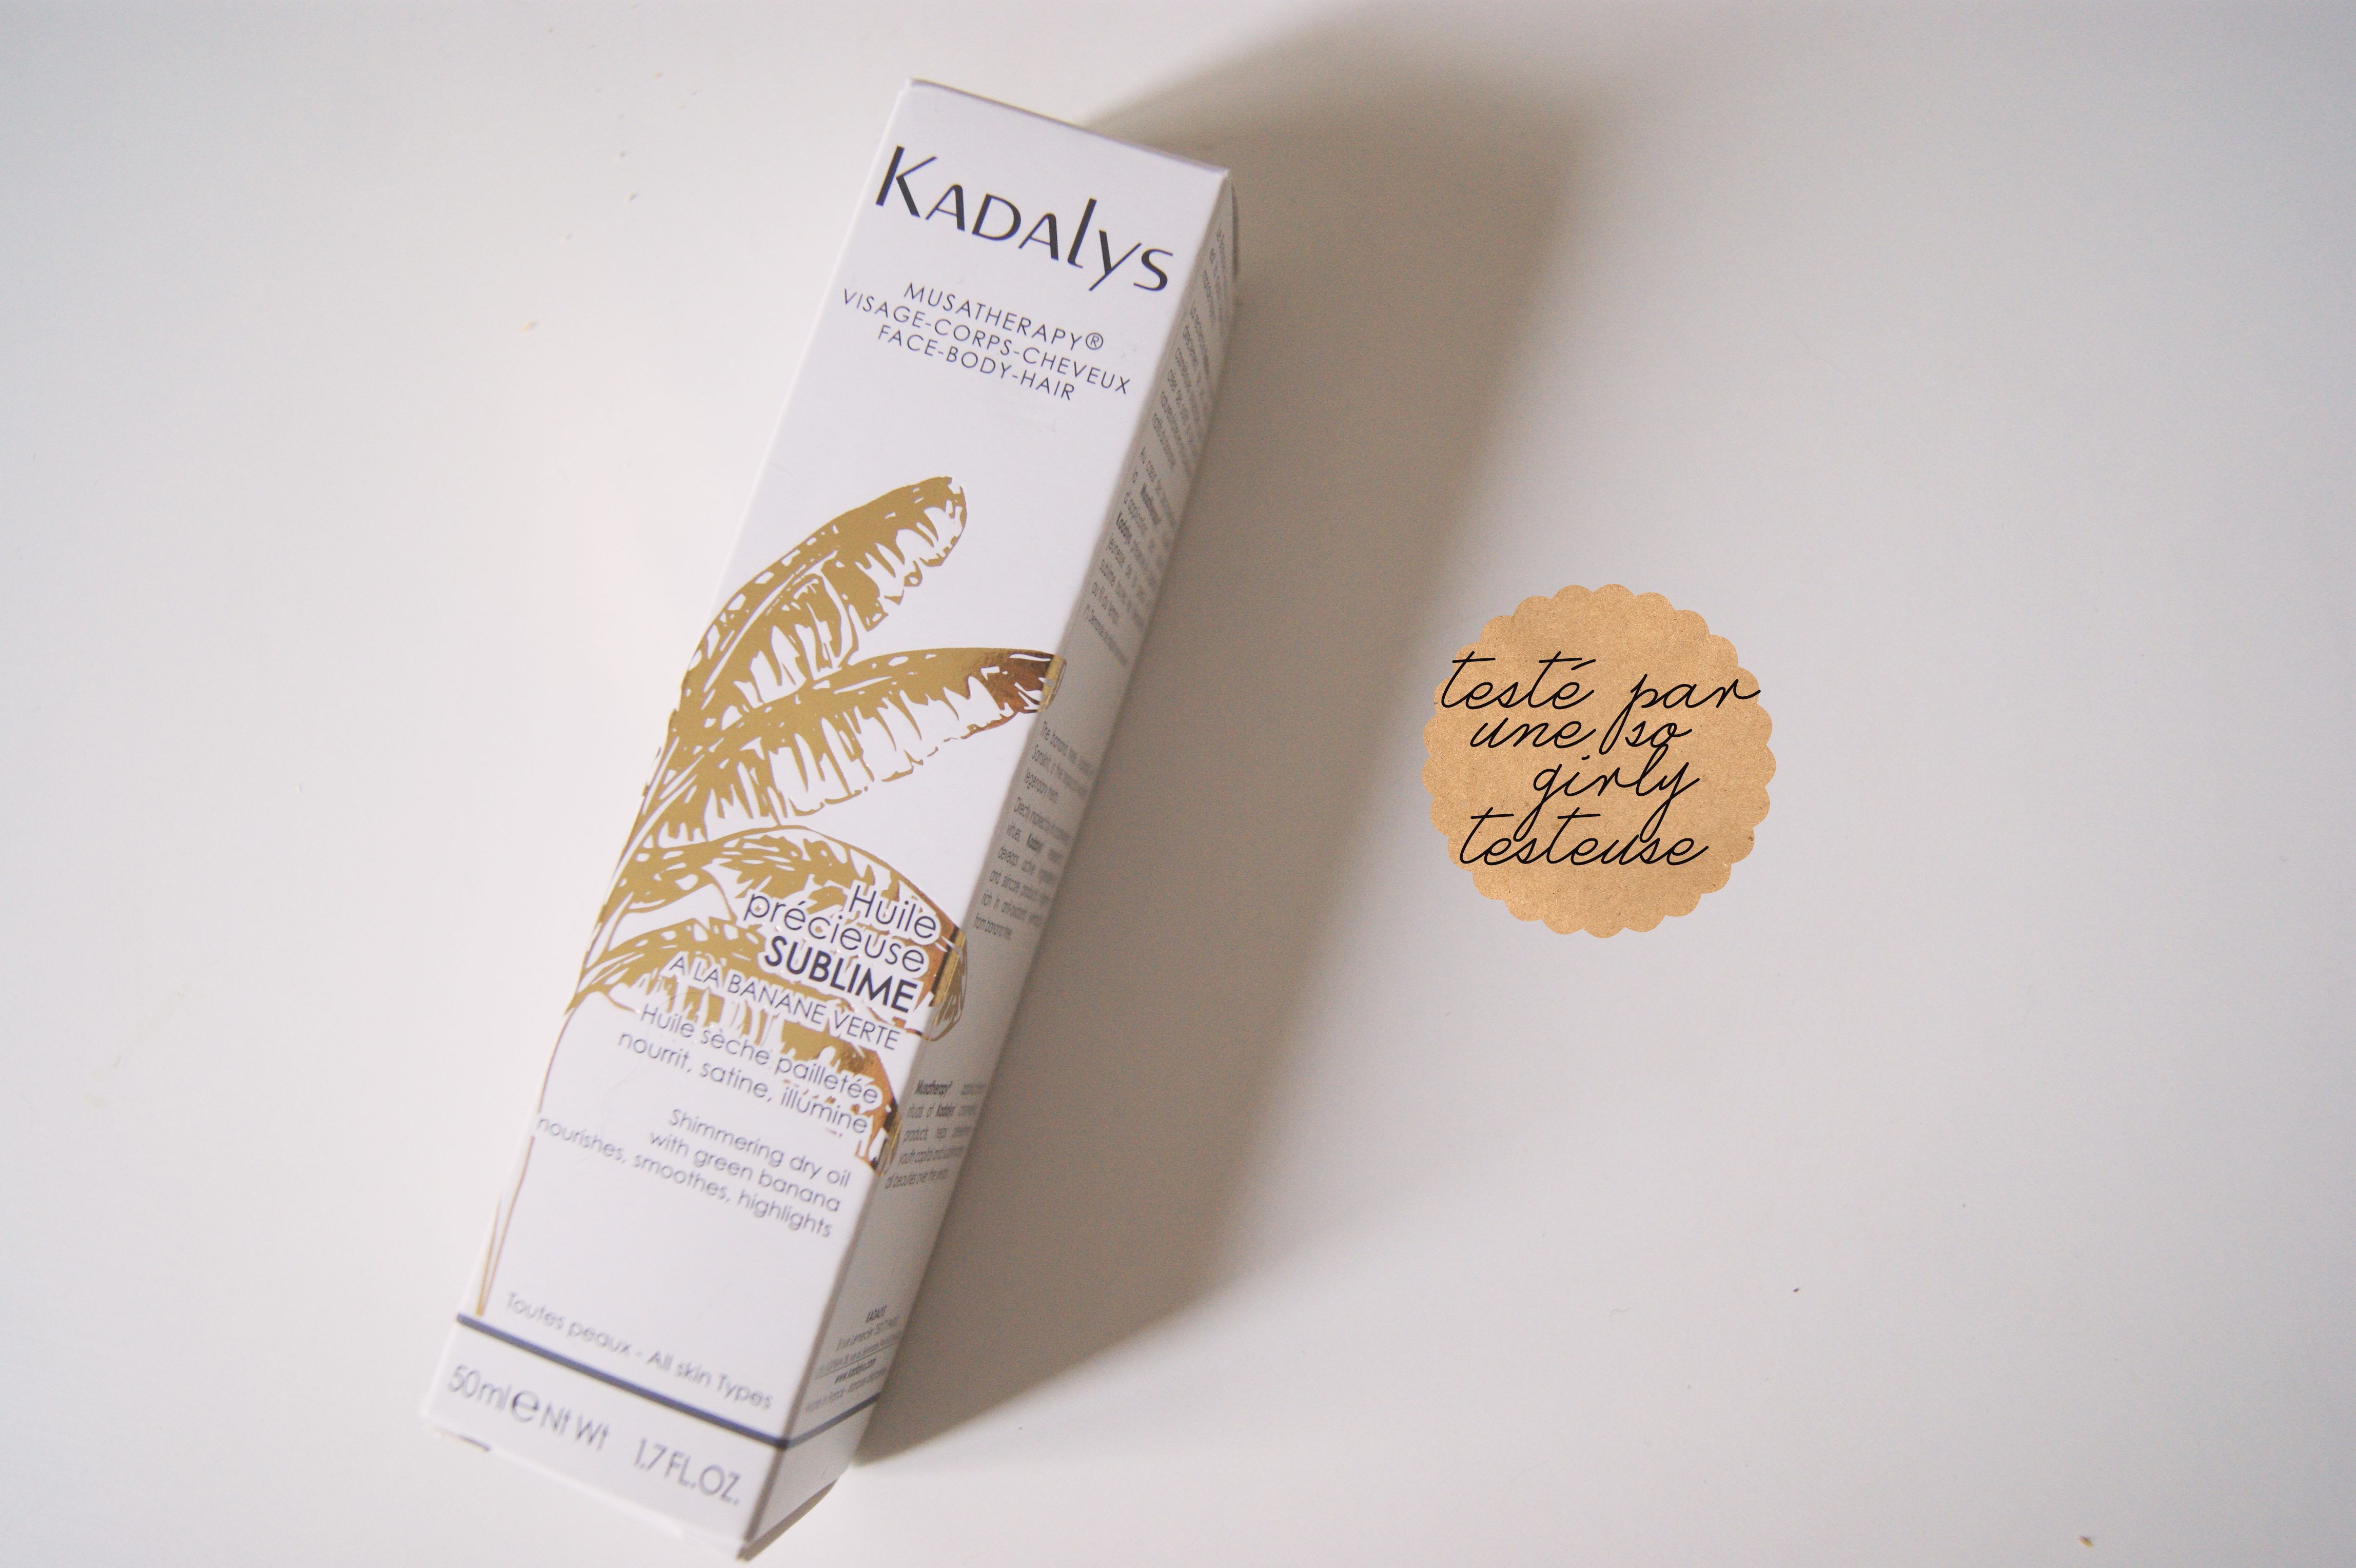 huile précieuse à la banane kadalys